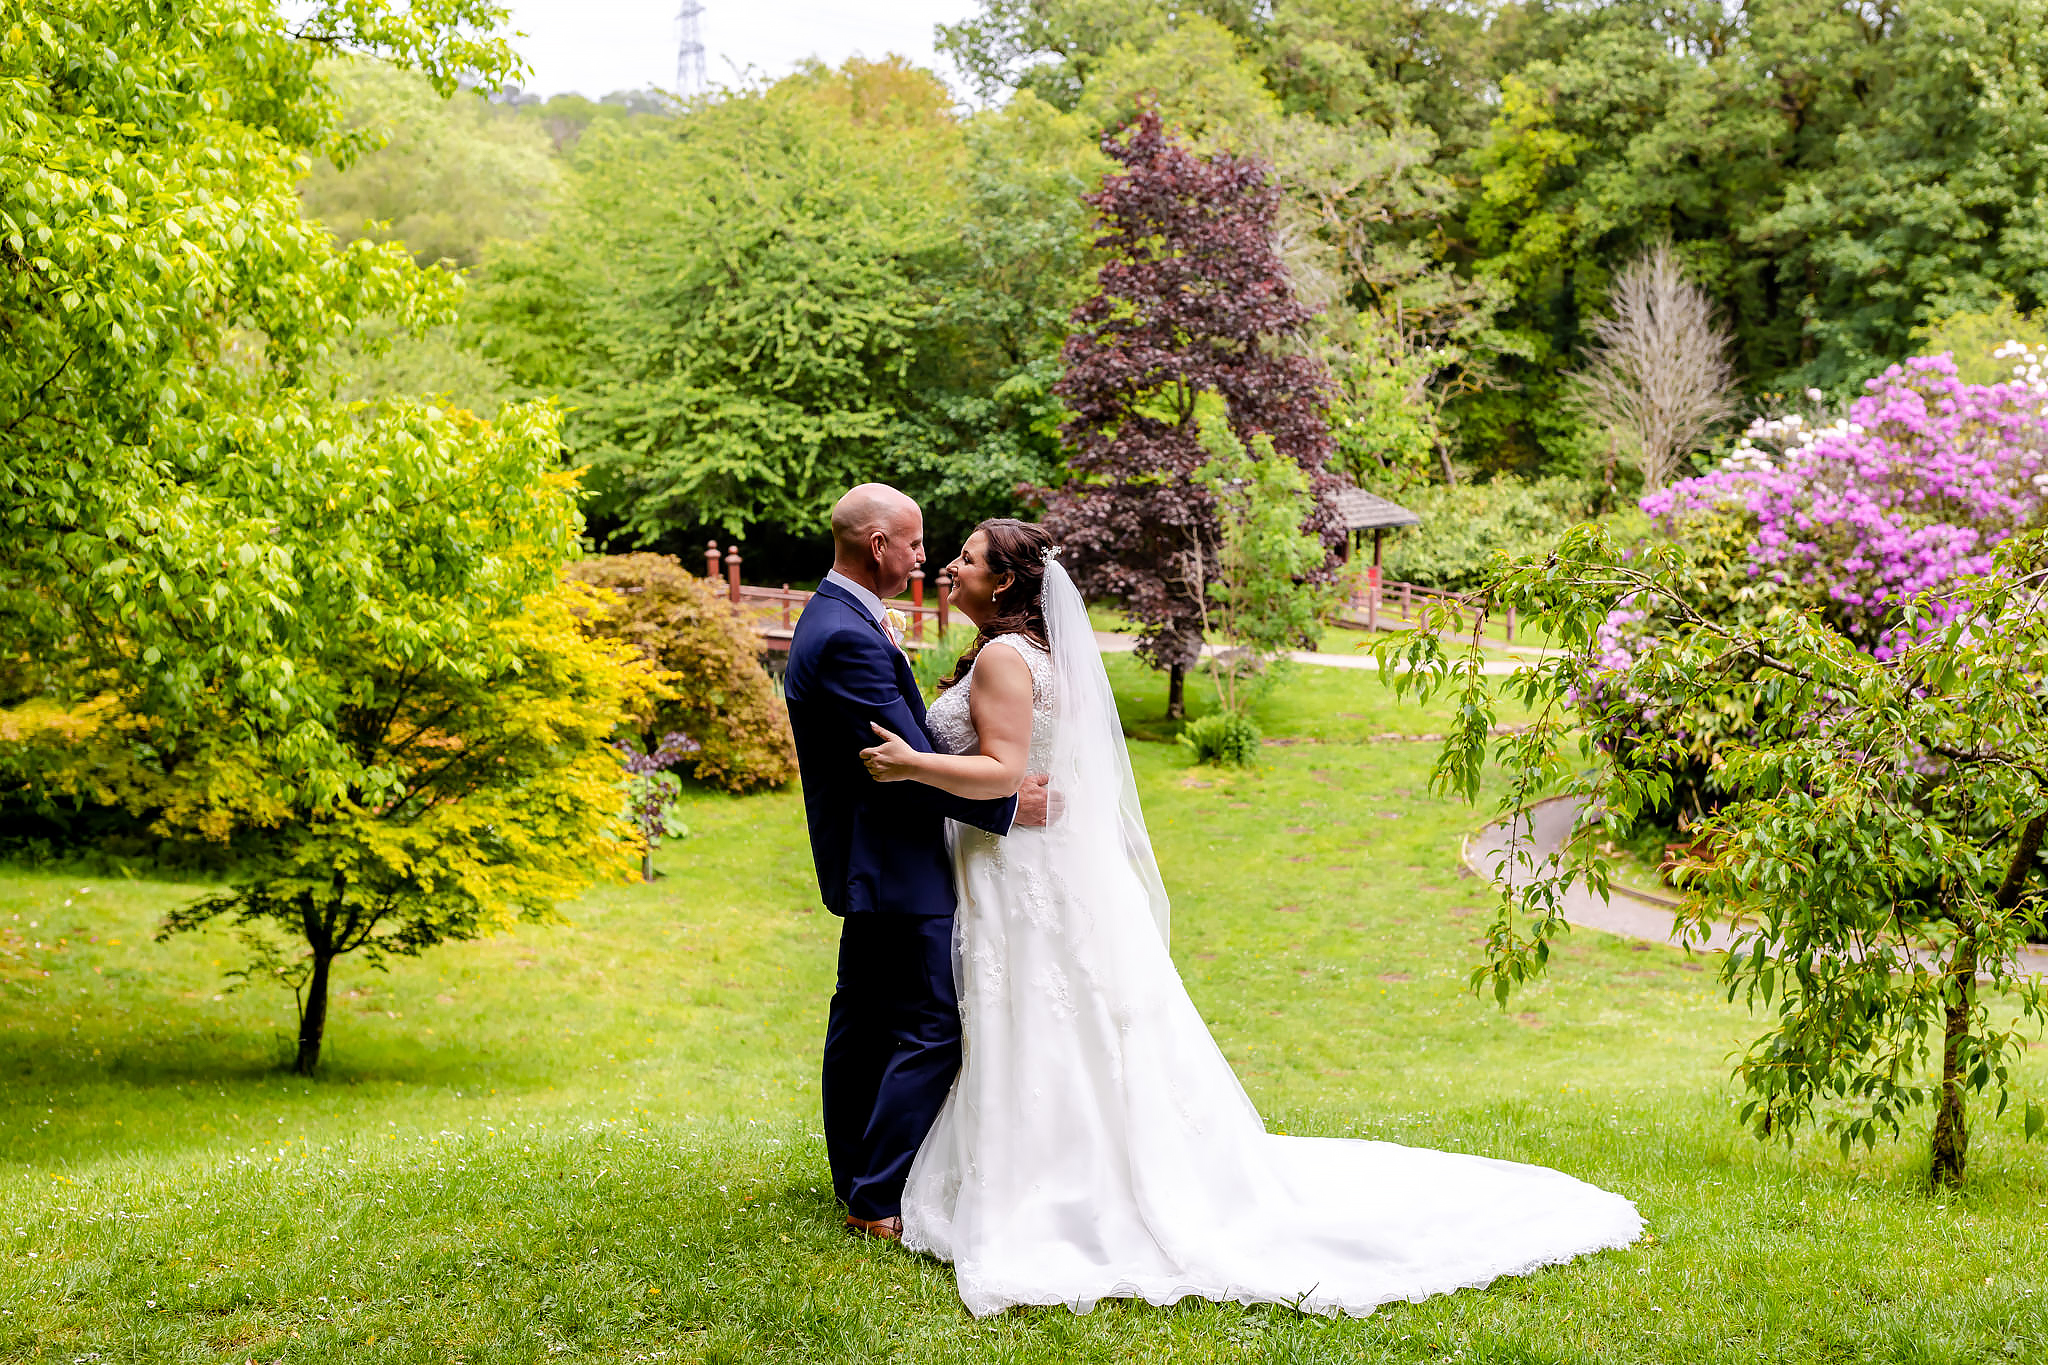 Bryngarw House Wedding Photography - Bride and Groom